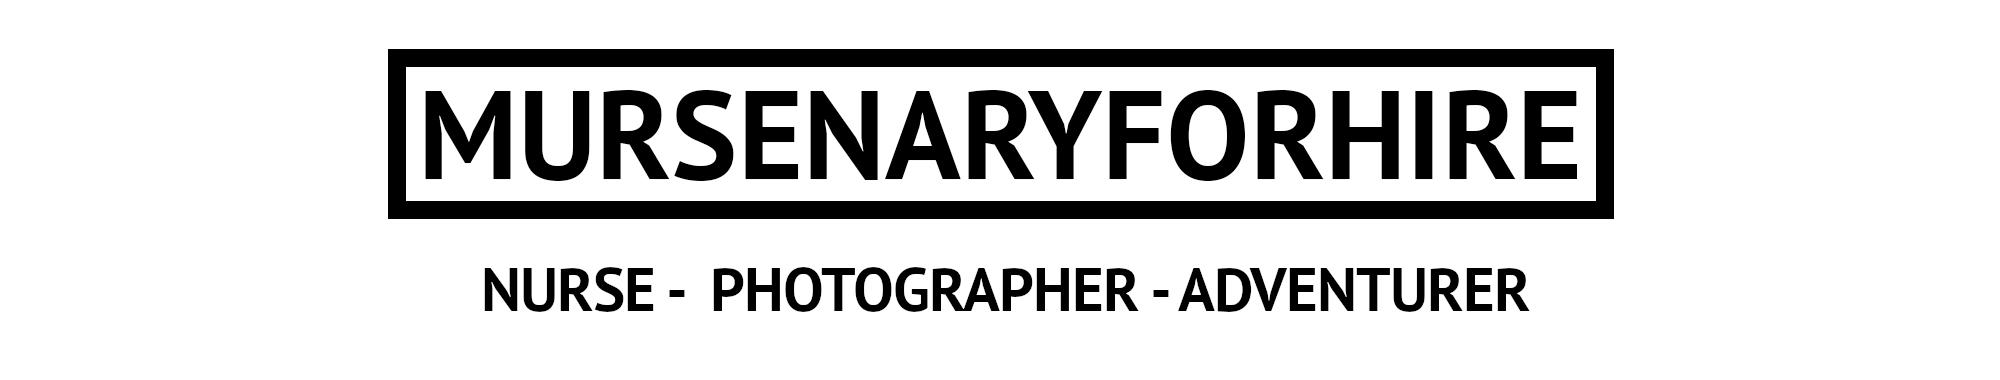 MursenaryForHire Photography